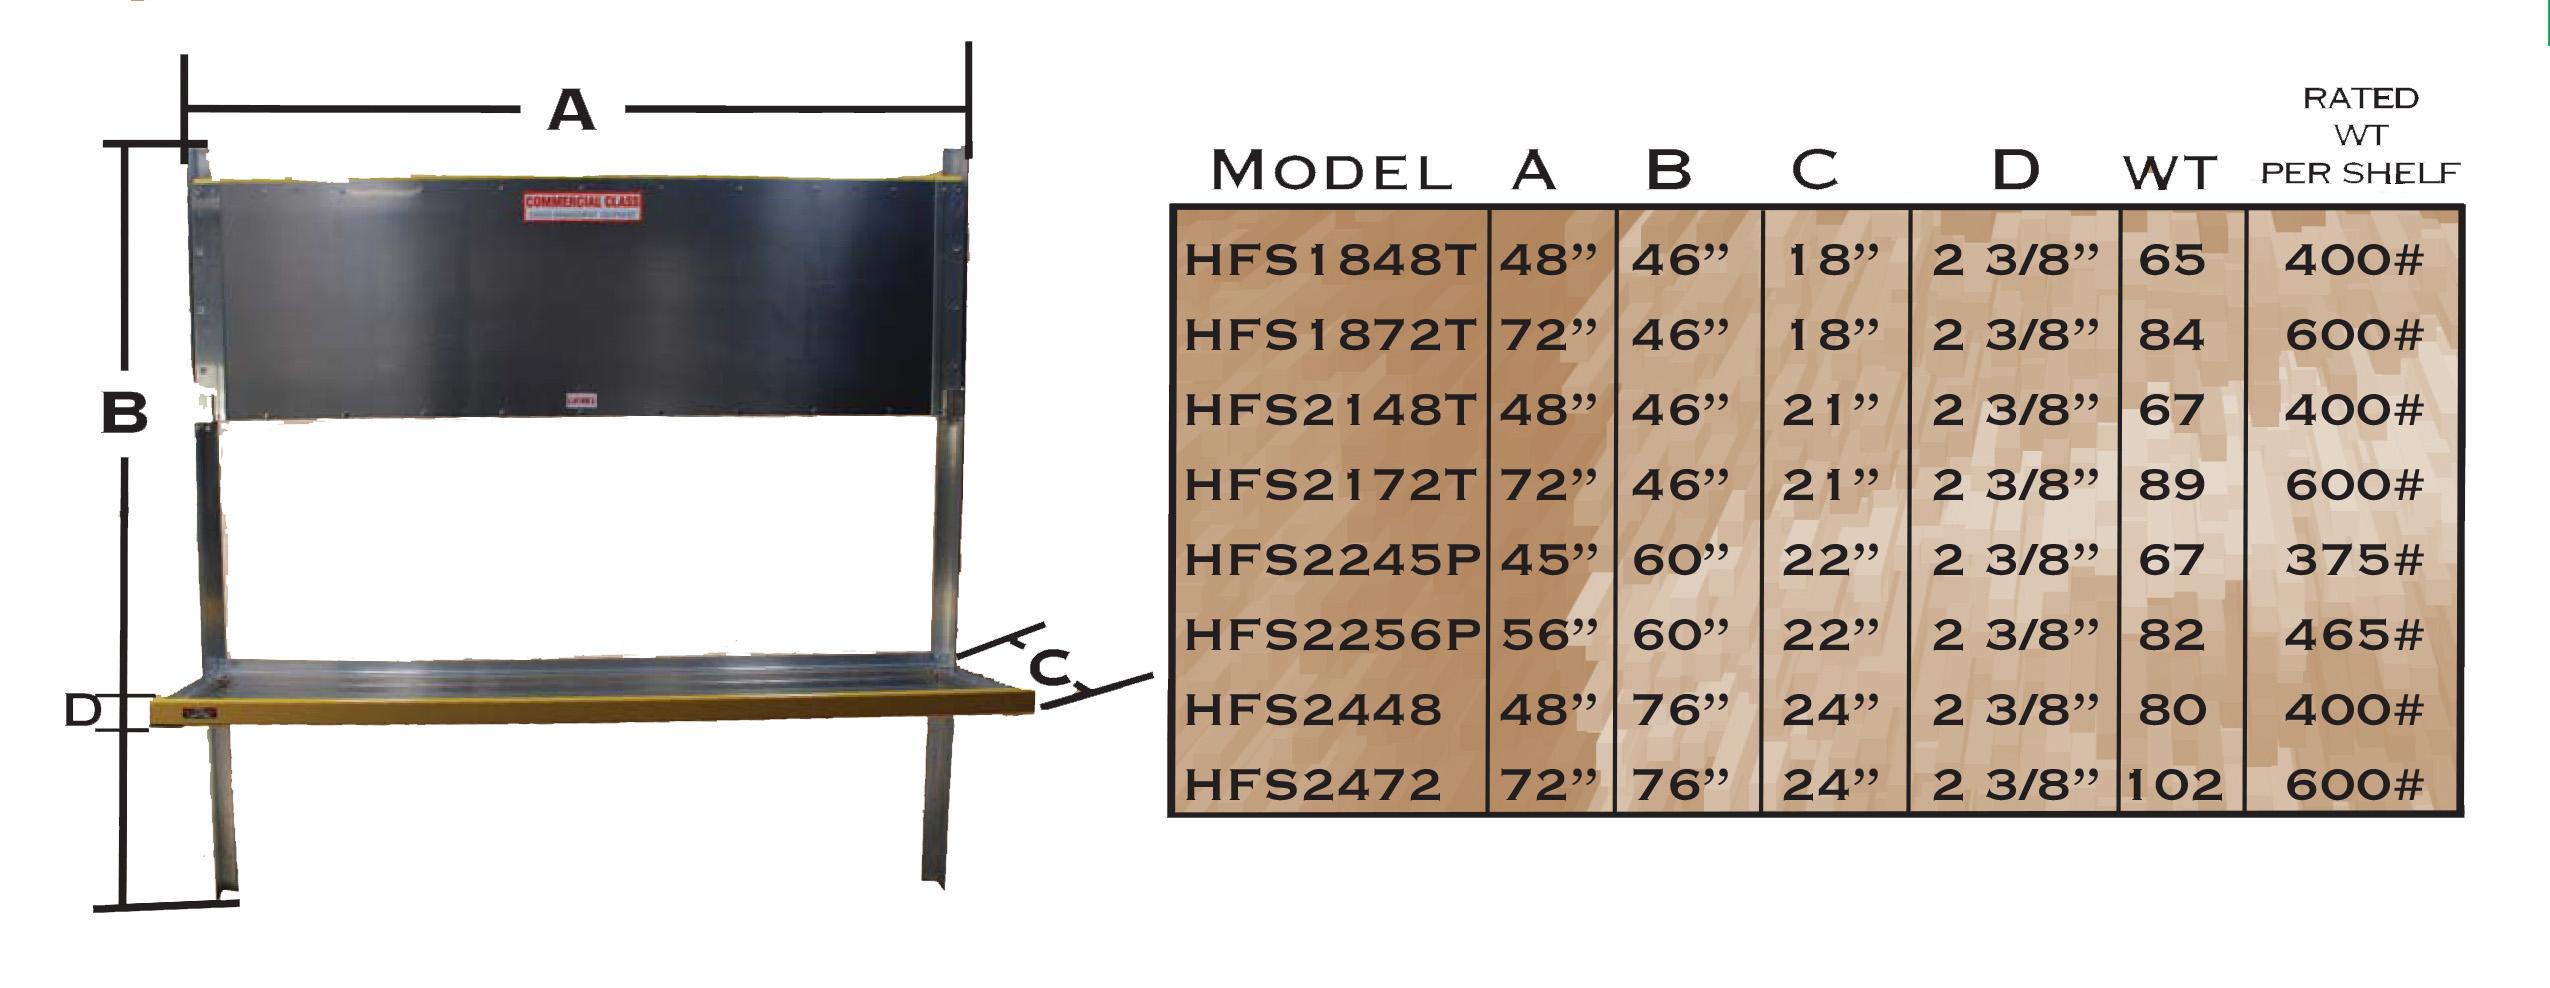 brute-shelf-sizes.jpg